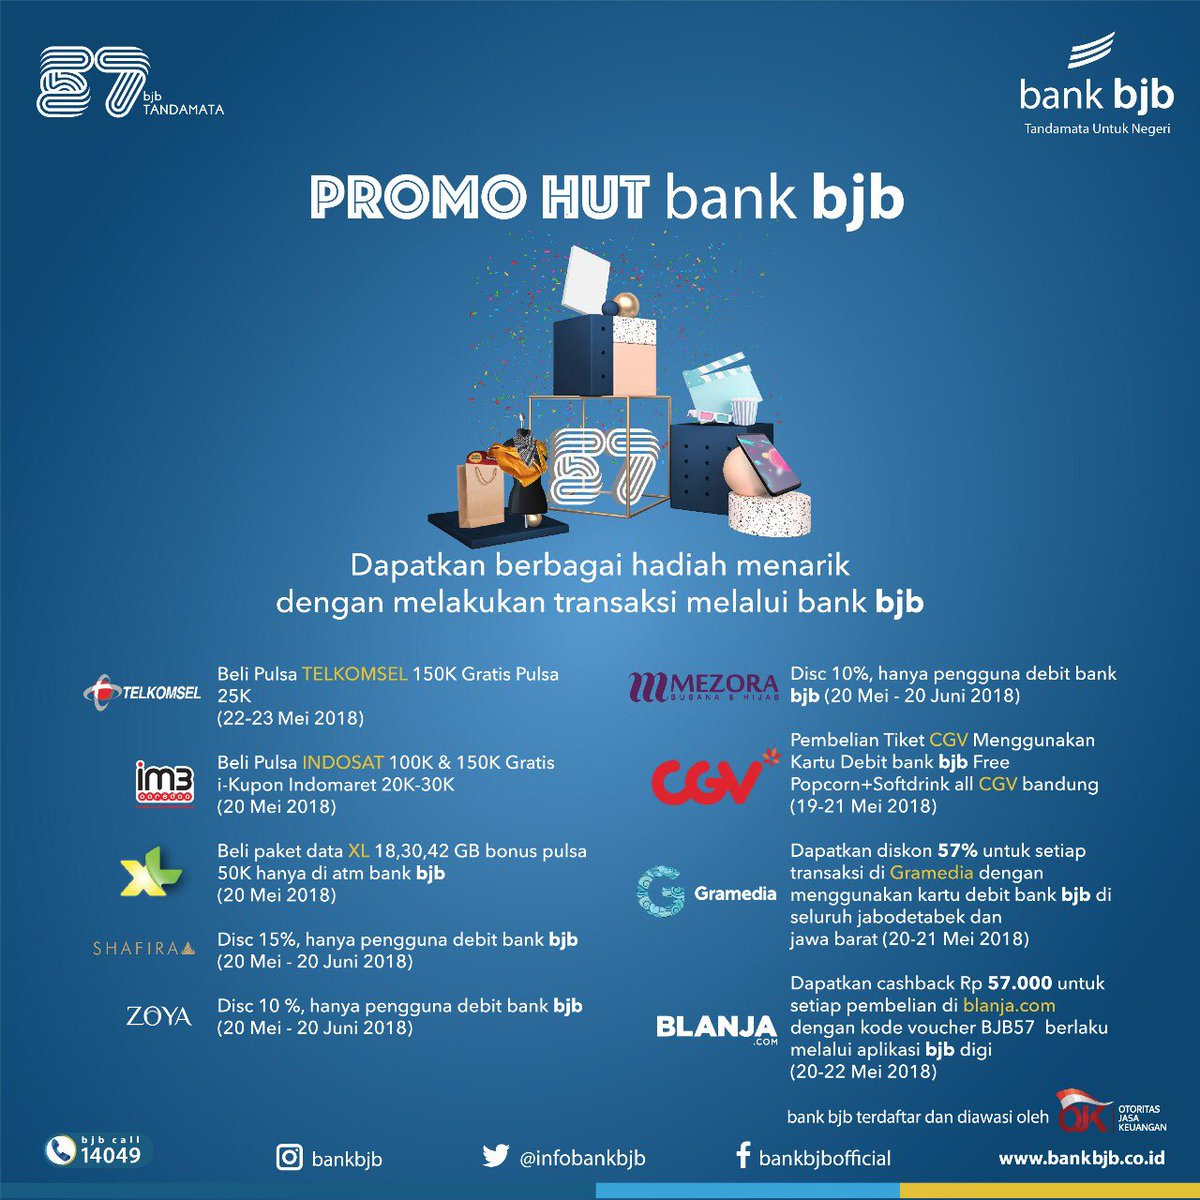 Bank Bjb u062fu0631 u062au0648u06ccu06ccu062au0631 Dlm Rangka Hut Bank Bjb Ke 57 Nikmati Beragam Penawaran Menarik Di Merchant Merchant Pilihan Selalu Lakukan Transaksi Menggunakan Bank Bjb Dptkan Beragam Keuntungan Bank Bjb Membangun Indonesia Memahami Negeri Bankbjb